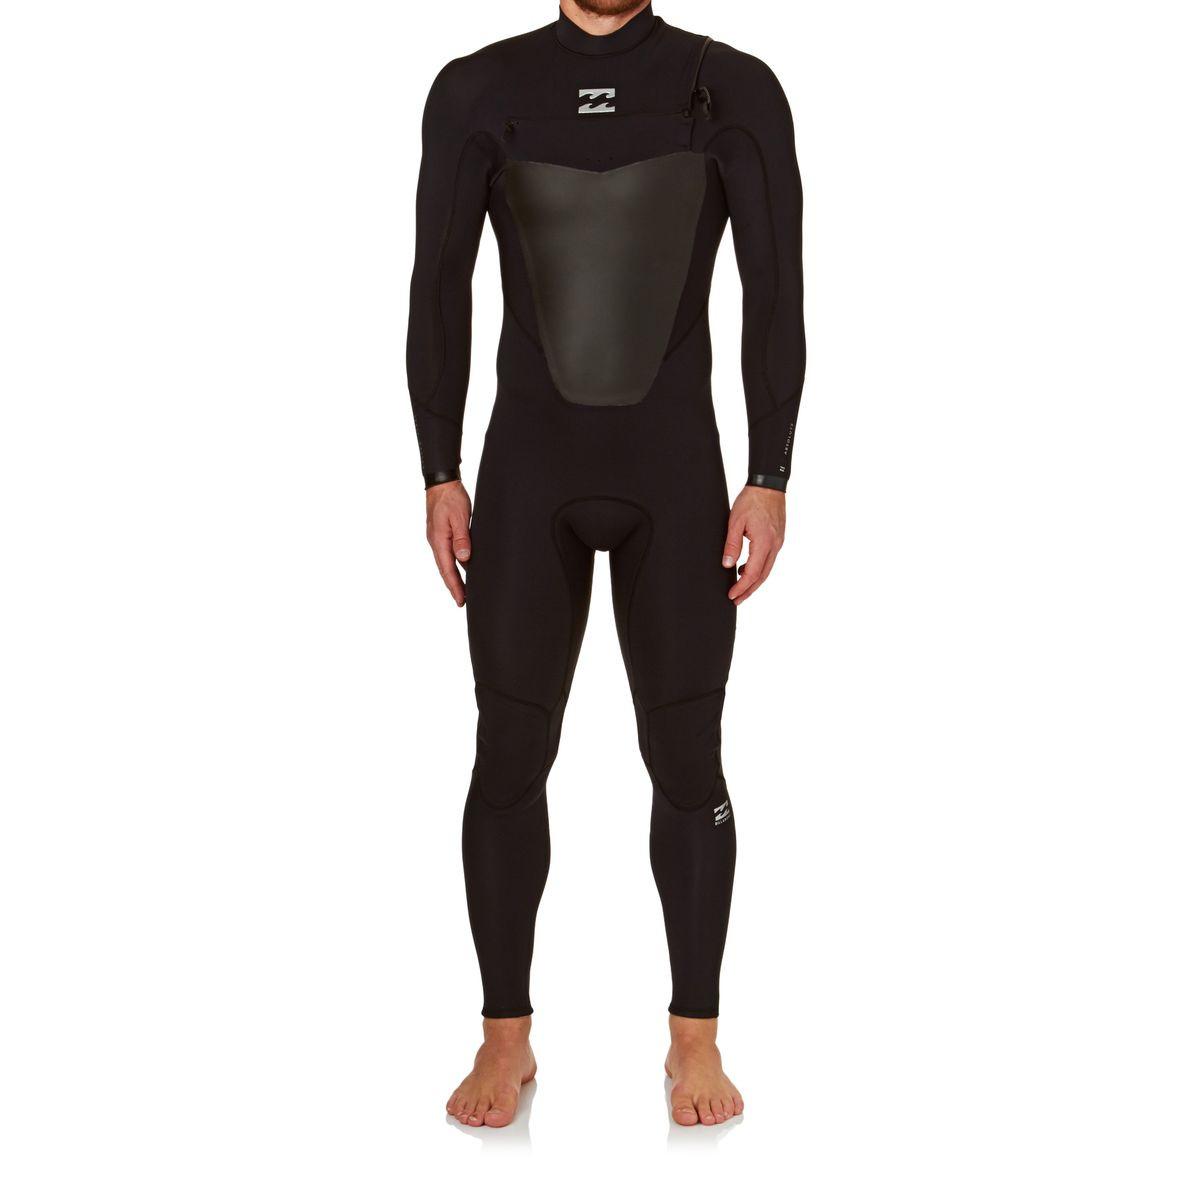 Billabong Absolute Comp 3/2mm 2017 Chest Zip Wetsuit - Black